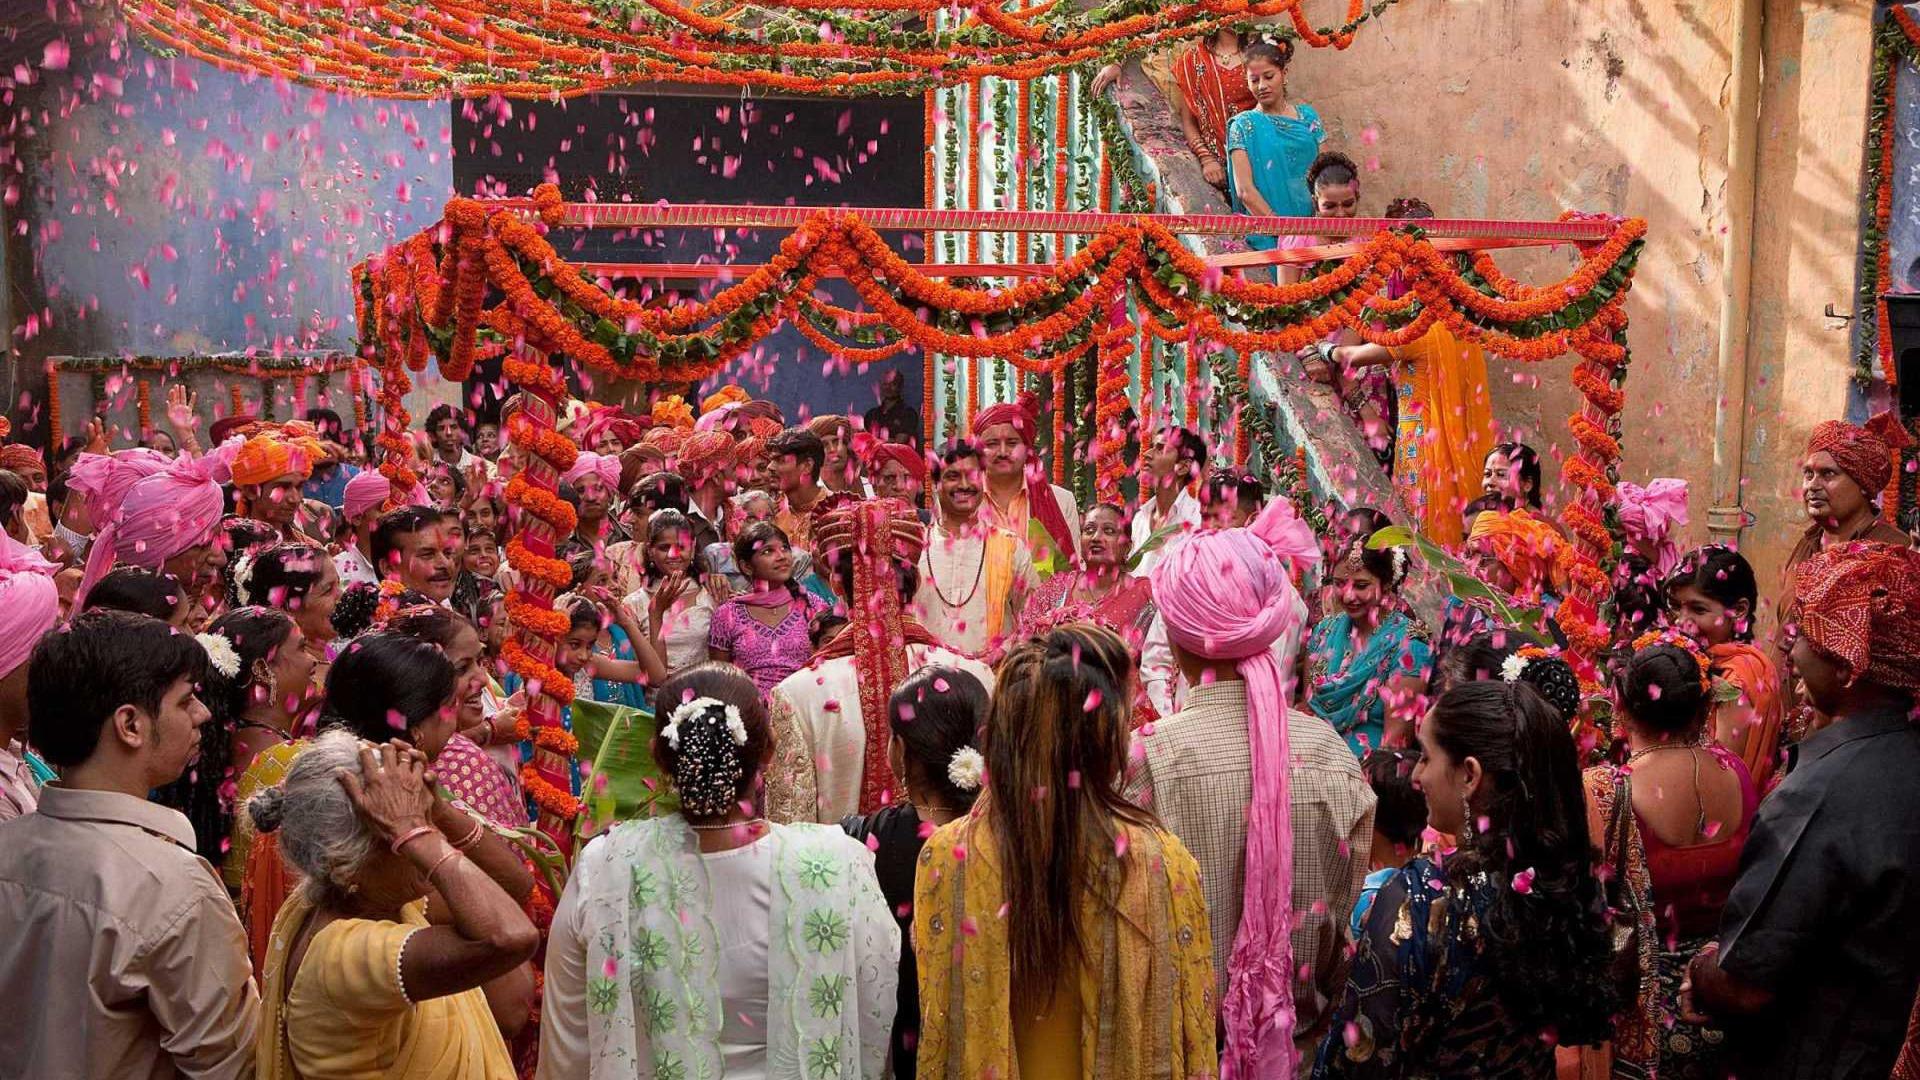 eat-pray-love-2010-indian-wedding-1920x1080-wide-wallpapers-net